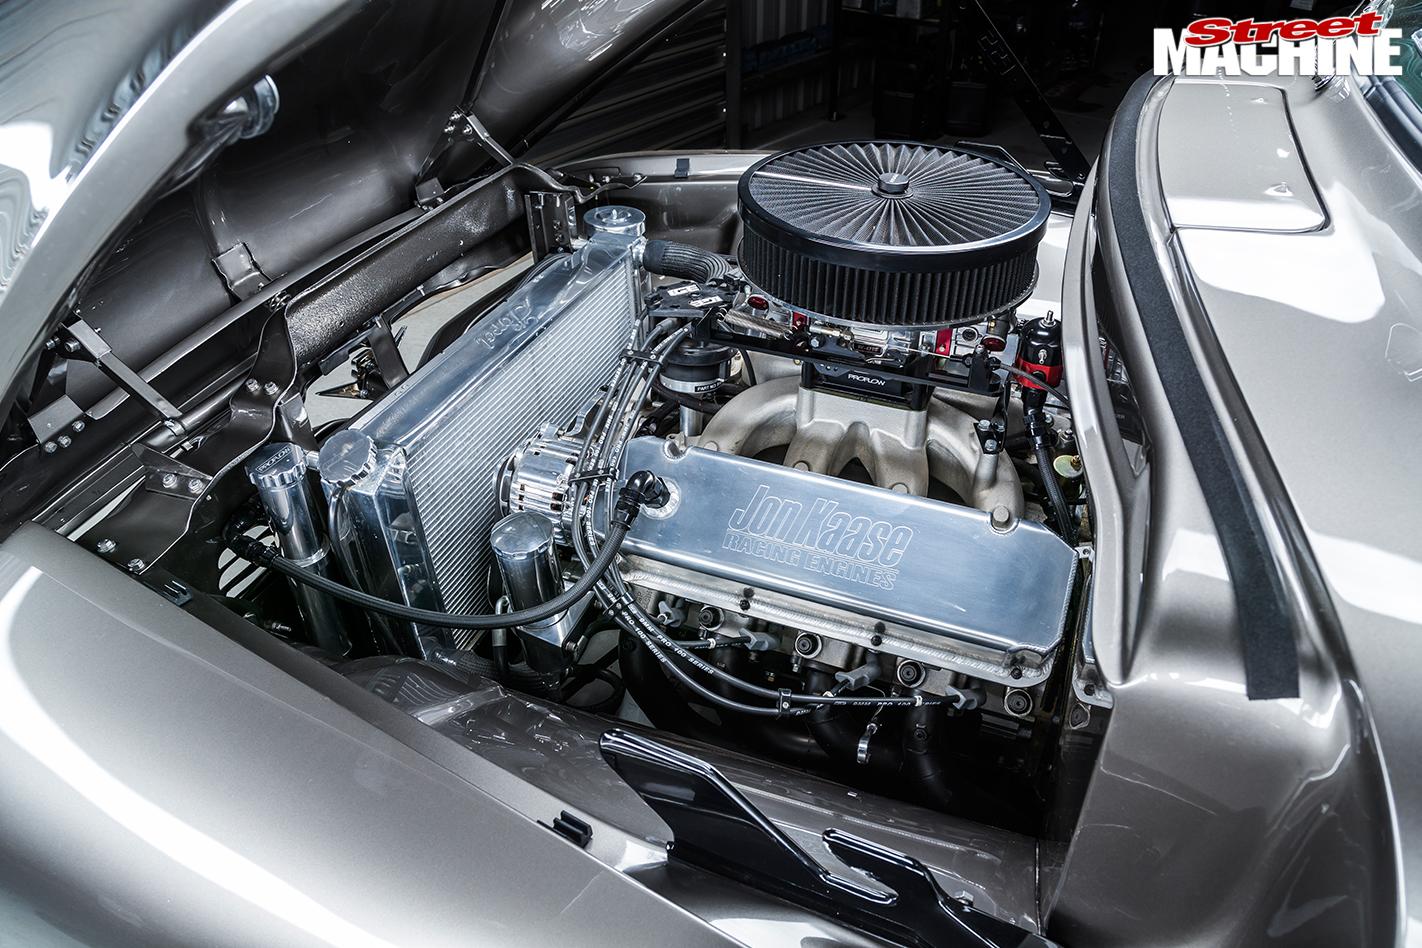 F100-engine